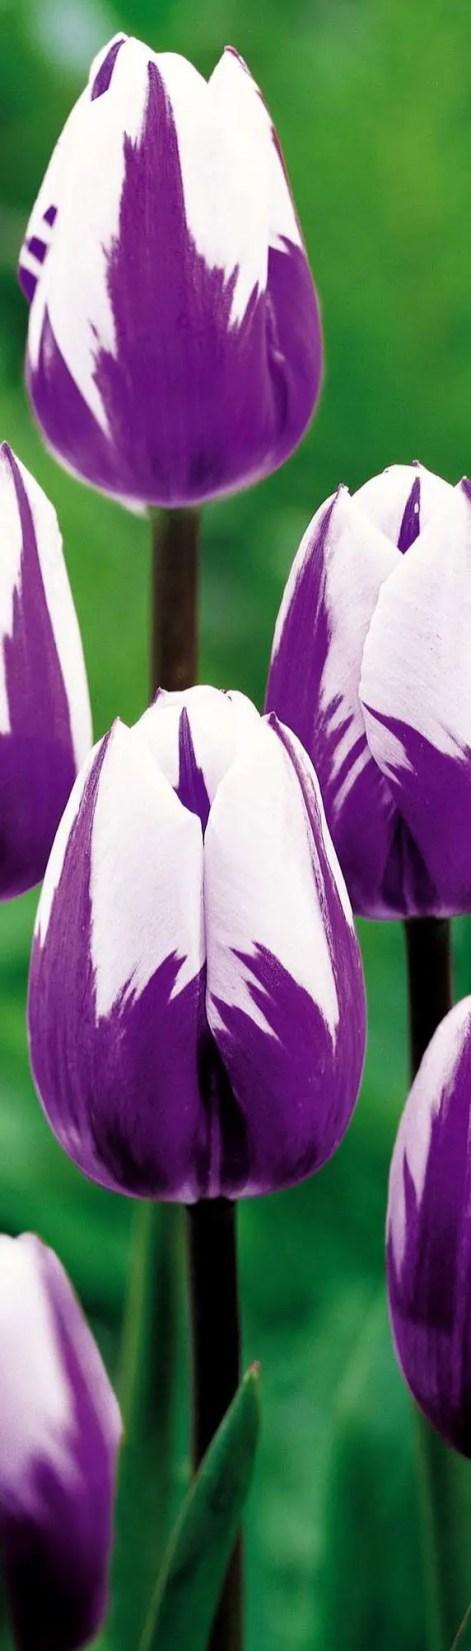 White Tulips 32